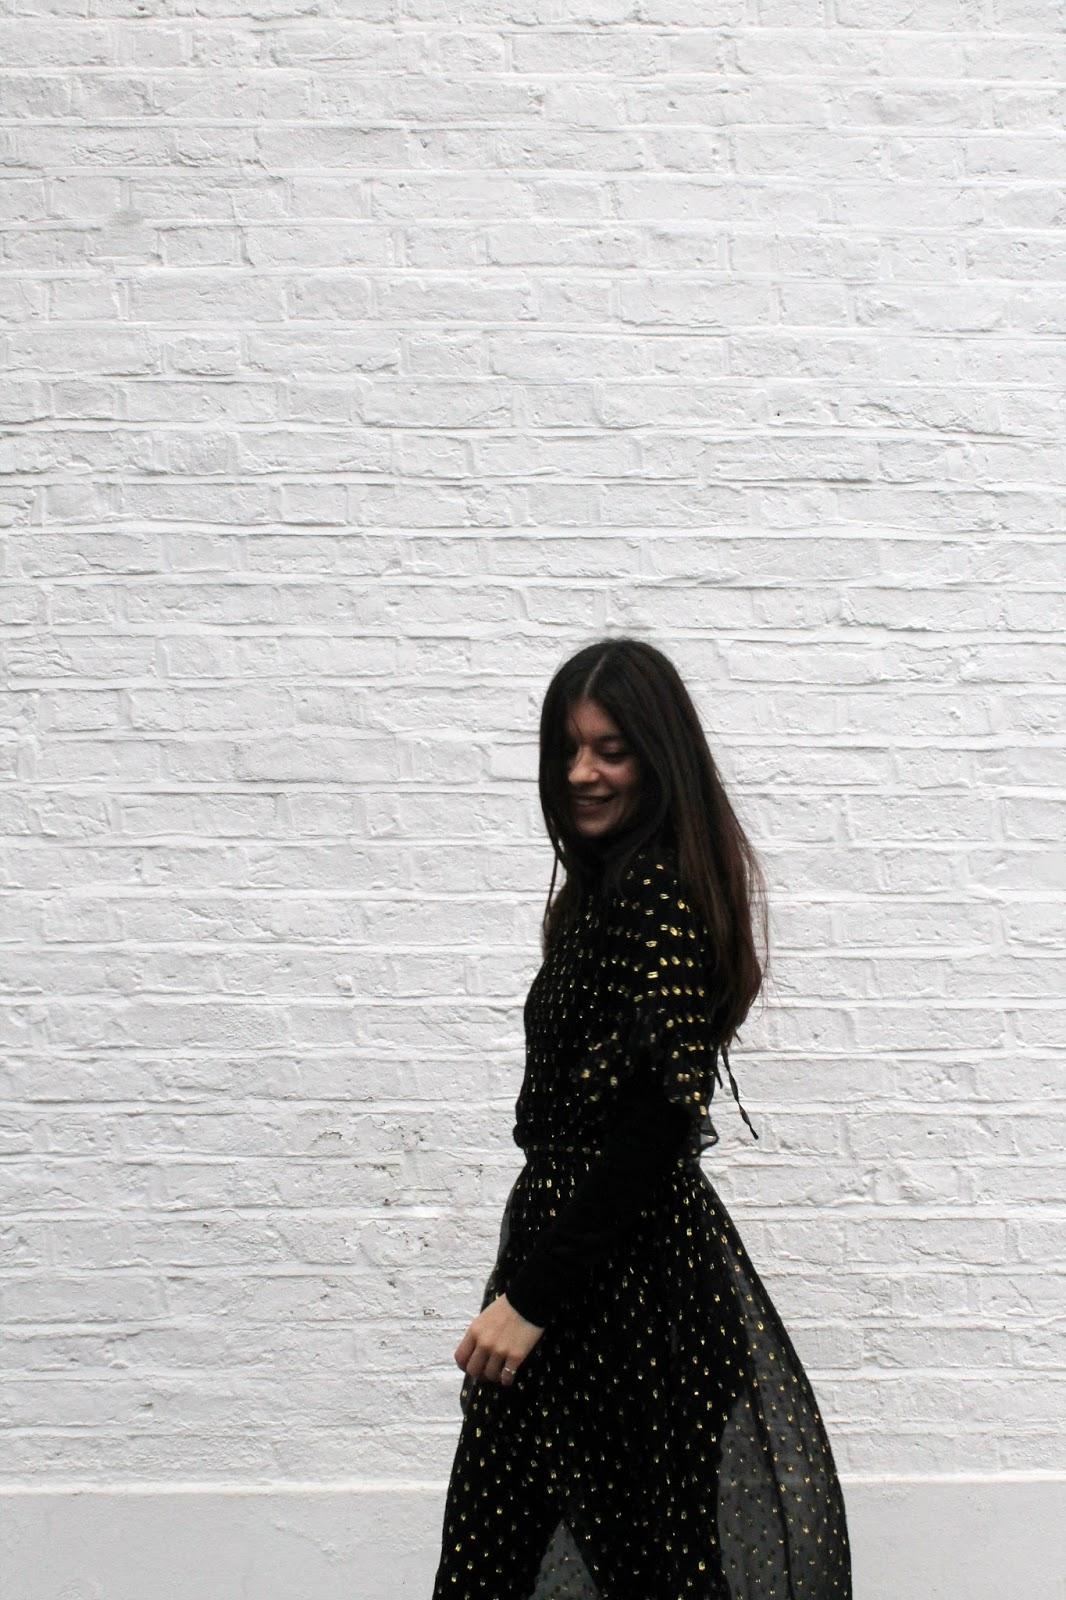 sheer dress, polka dot, gold and black, fbloggers, fashion blogger style, miss selfridge dress, uniqlo turtleneck, microinfluencer